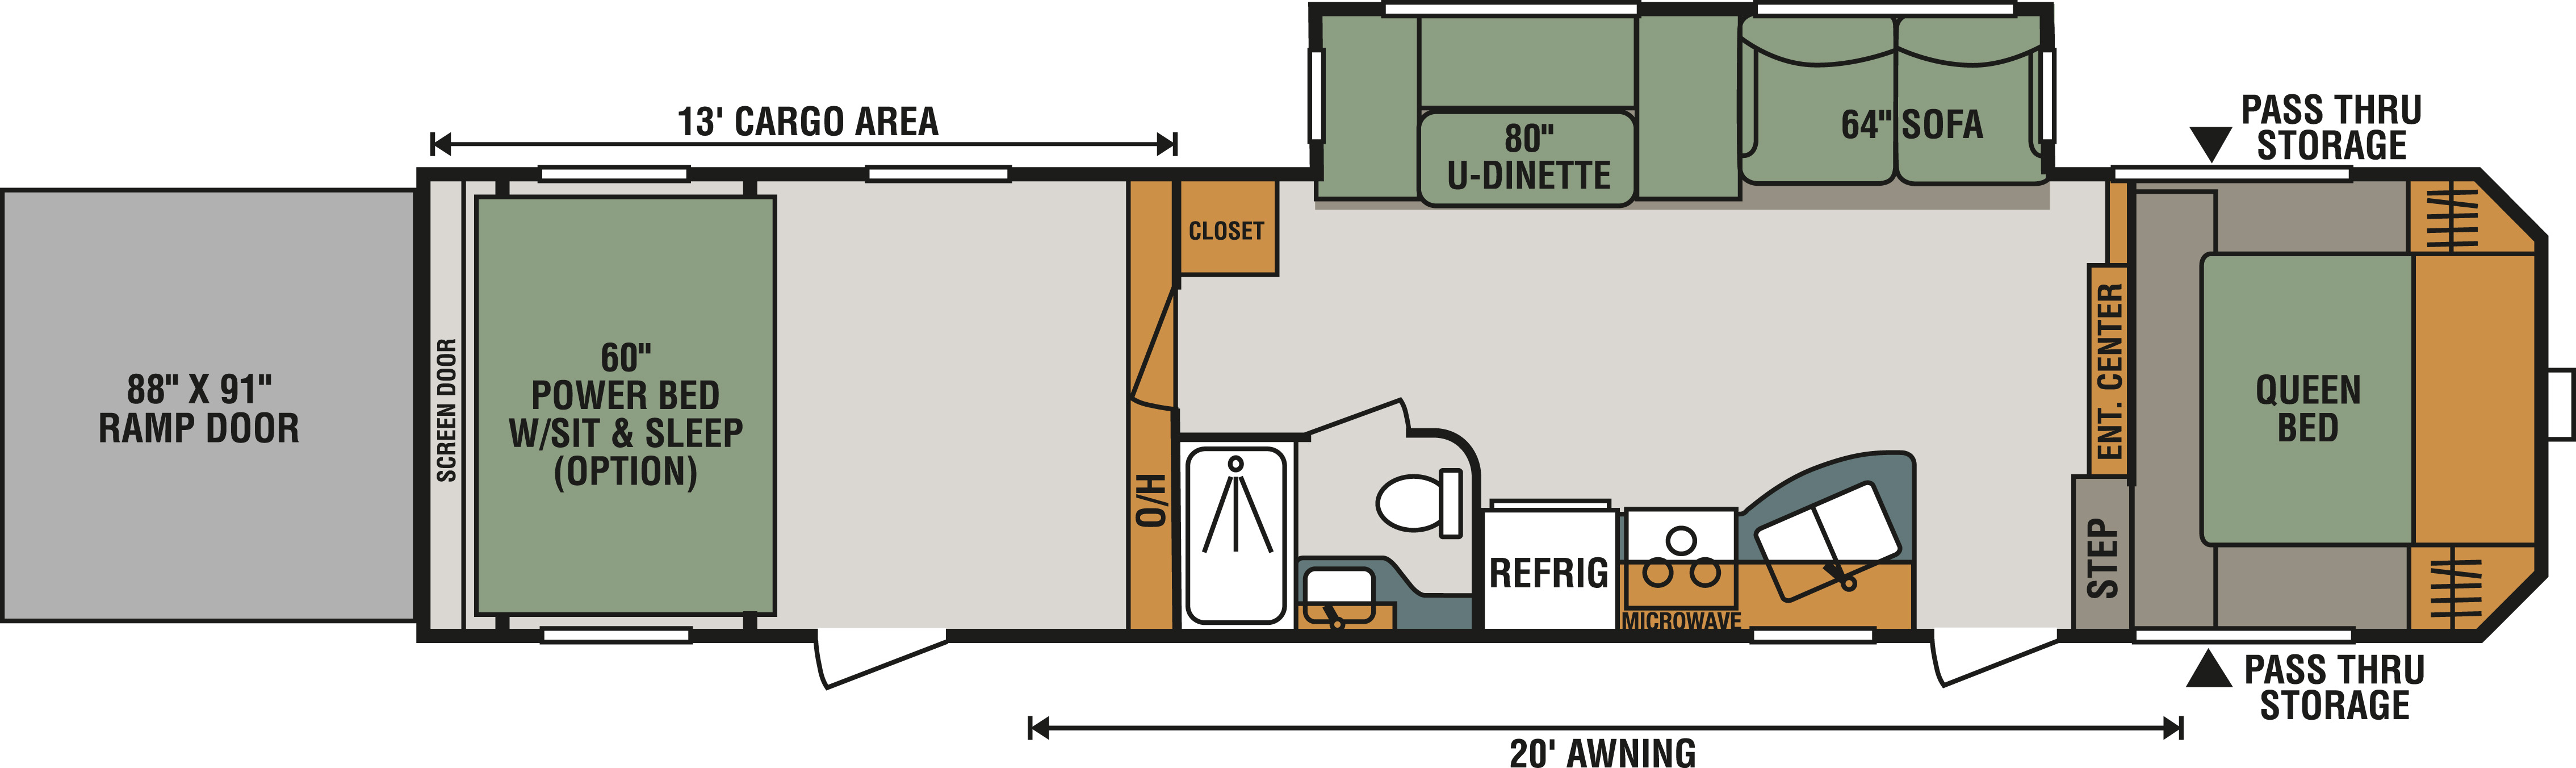 331TH13 Floorplan